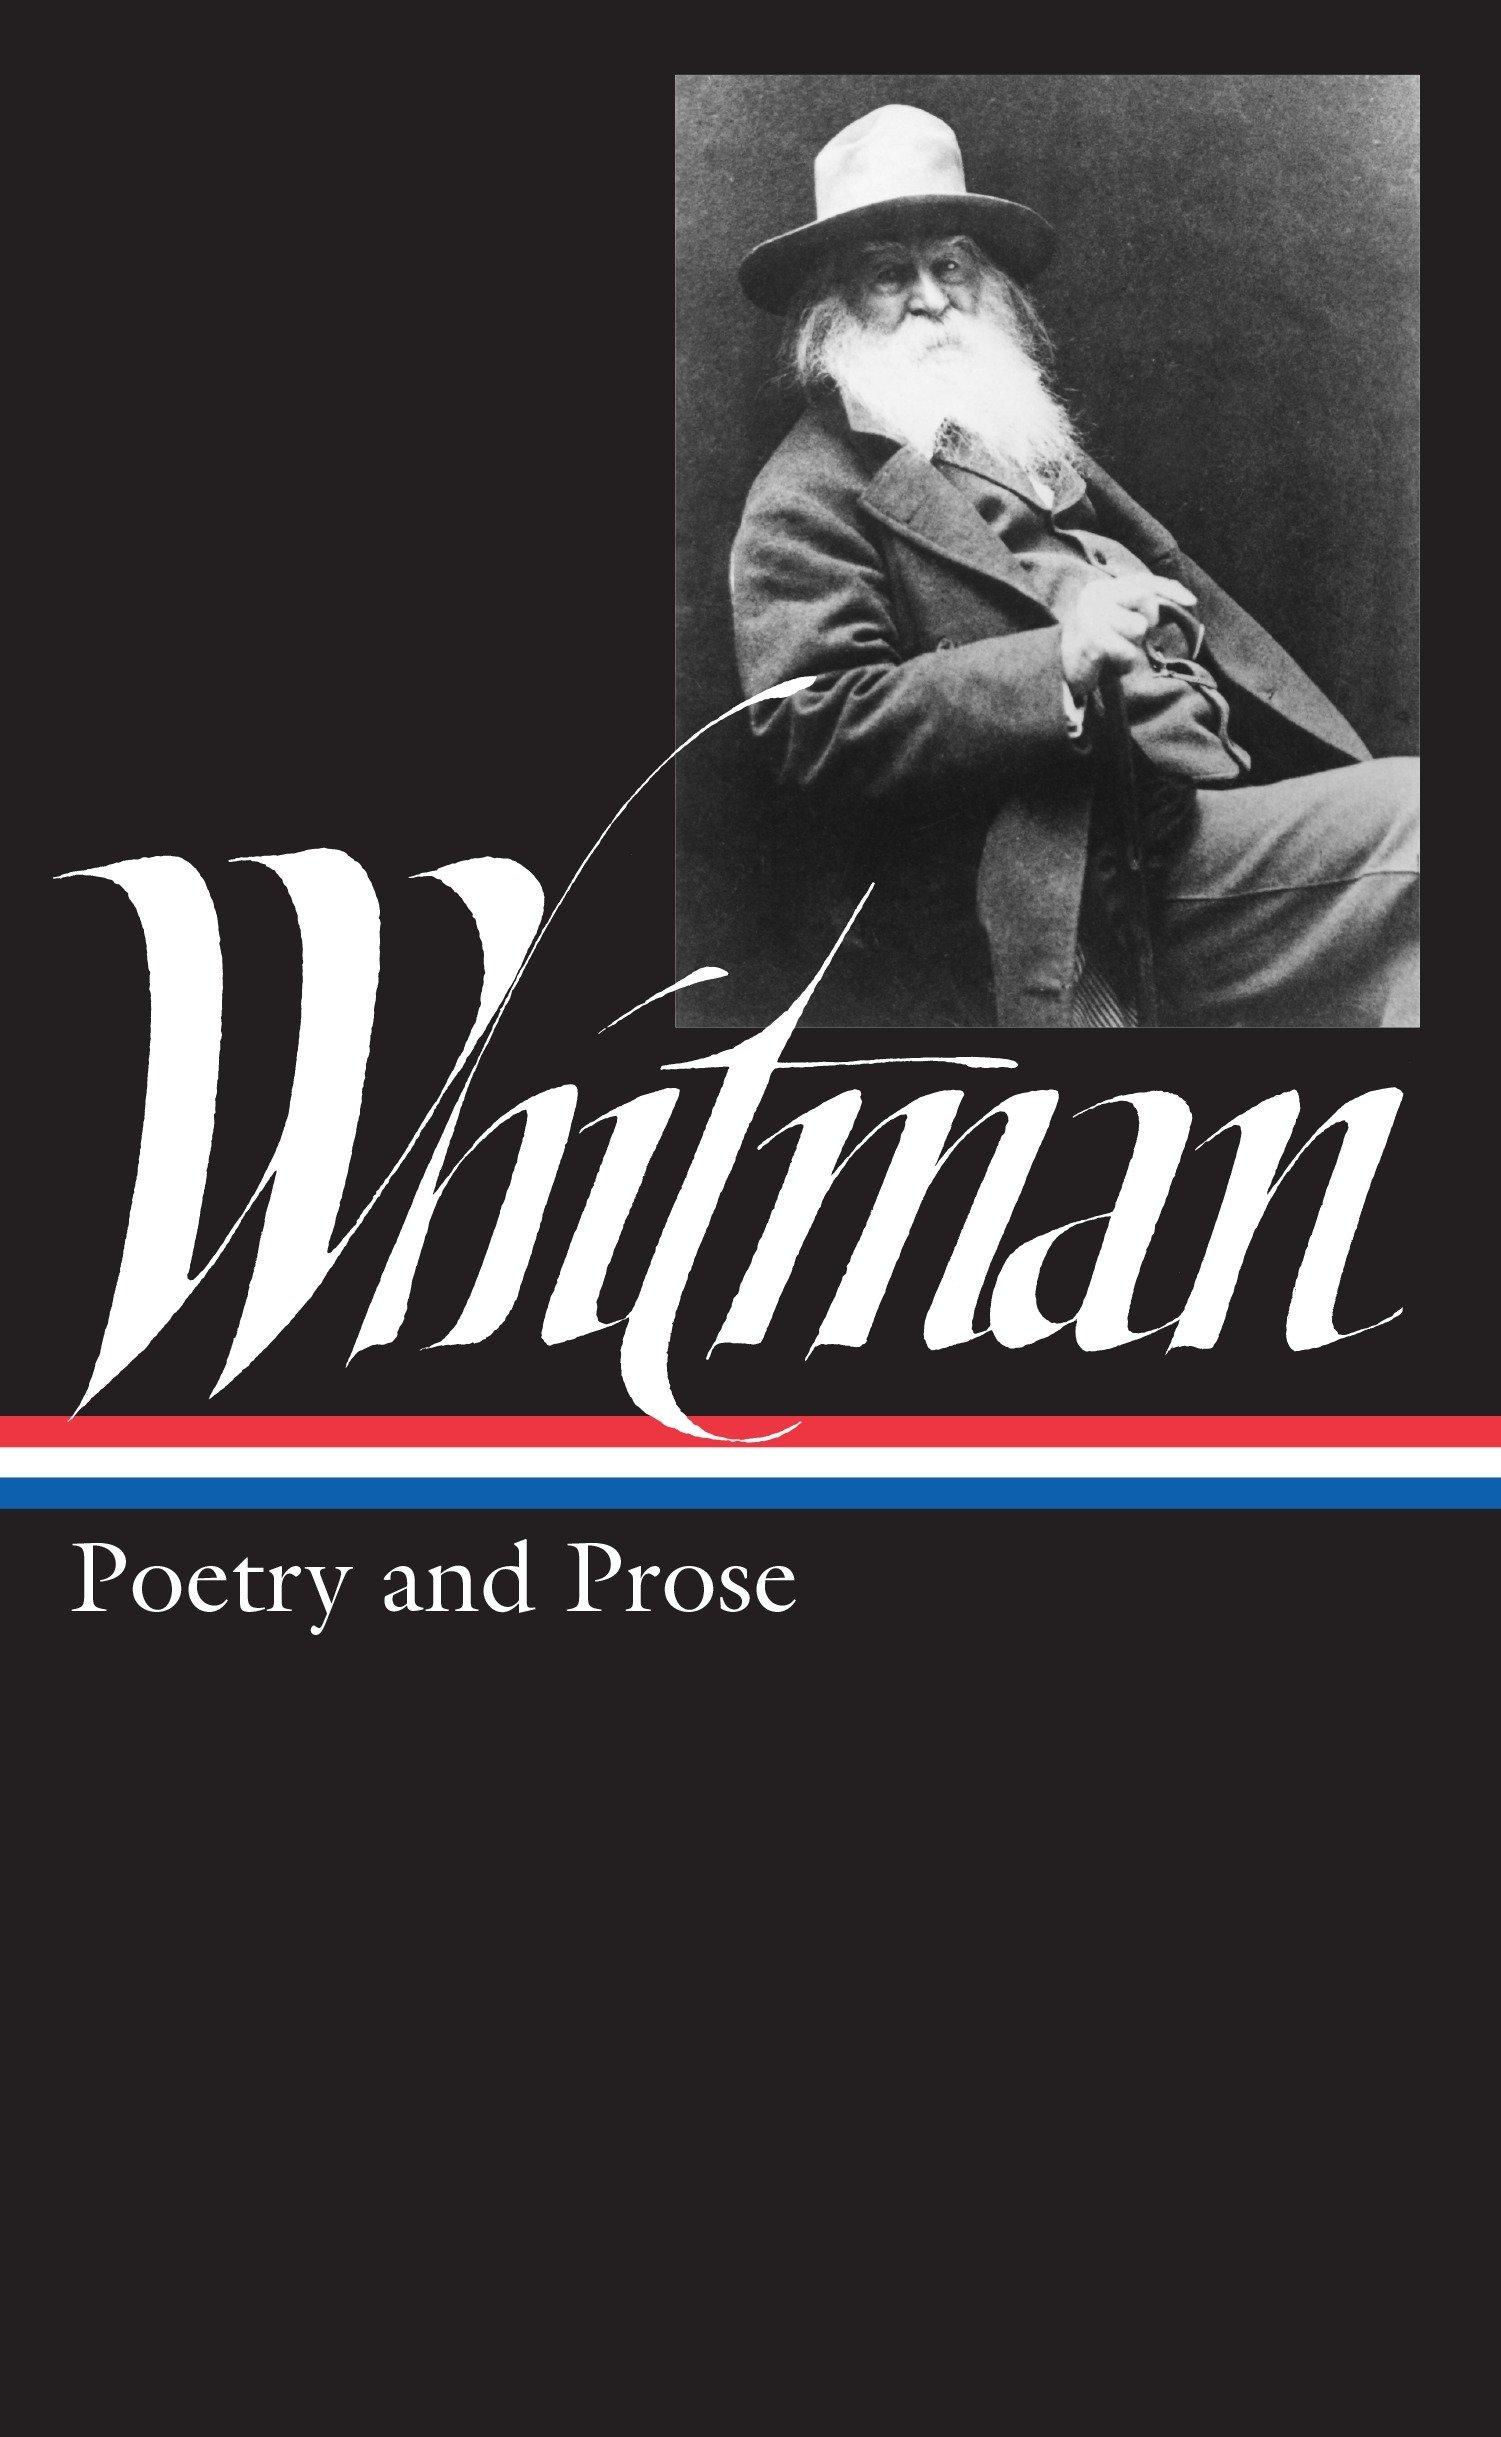 Walt Whitman: Poetry and Prose (Library of America): Walt Whitman, Justin  Kaplan: 9780940450028: Amazon.com: Books